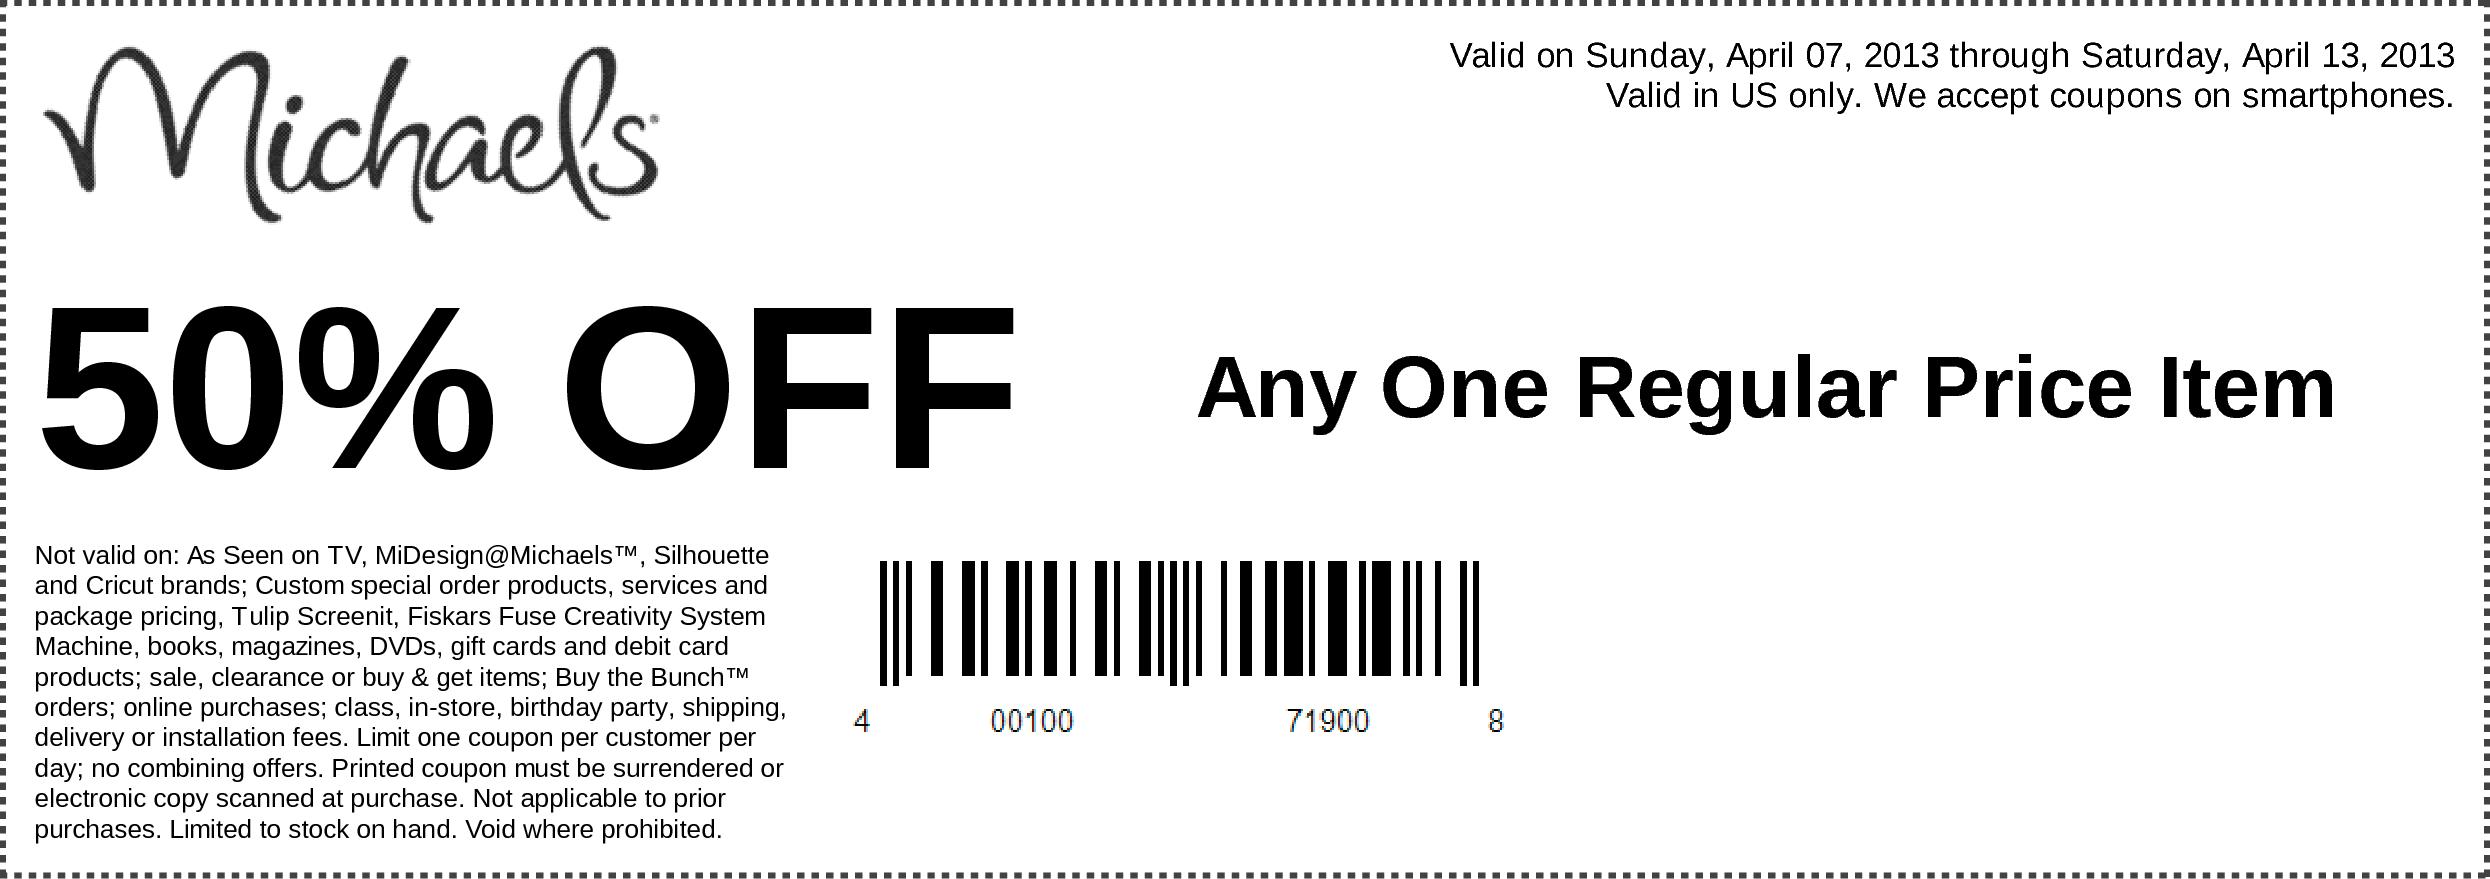 42++ Save on craftscom online coupon code information